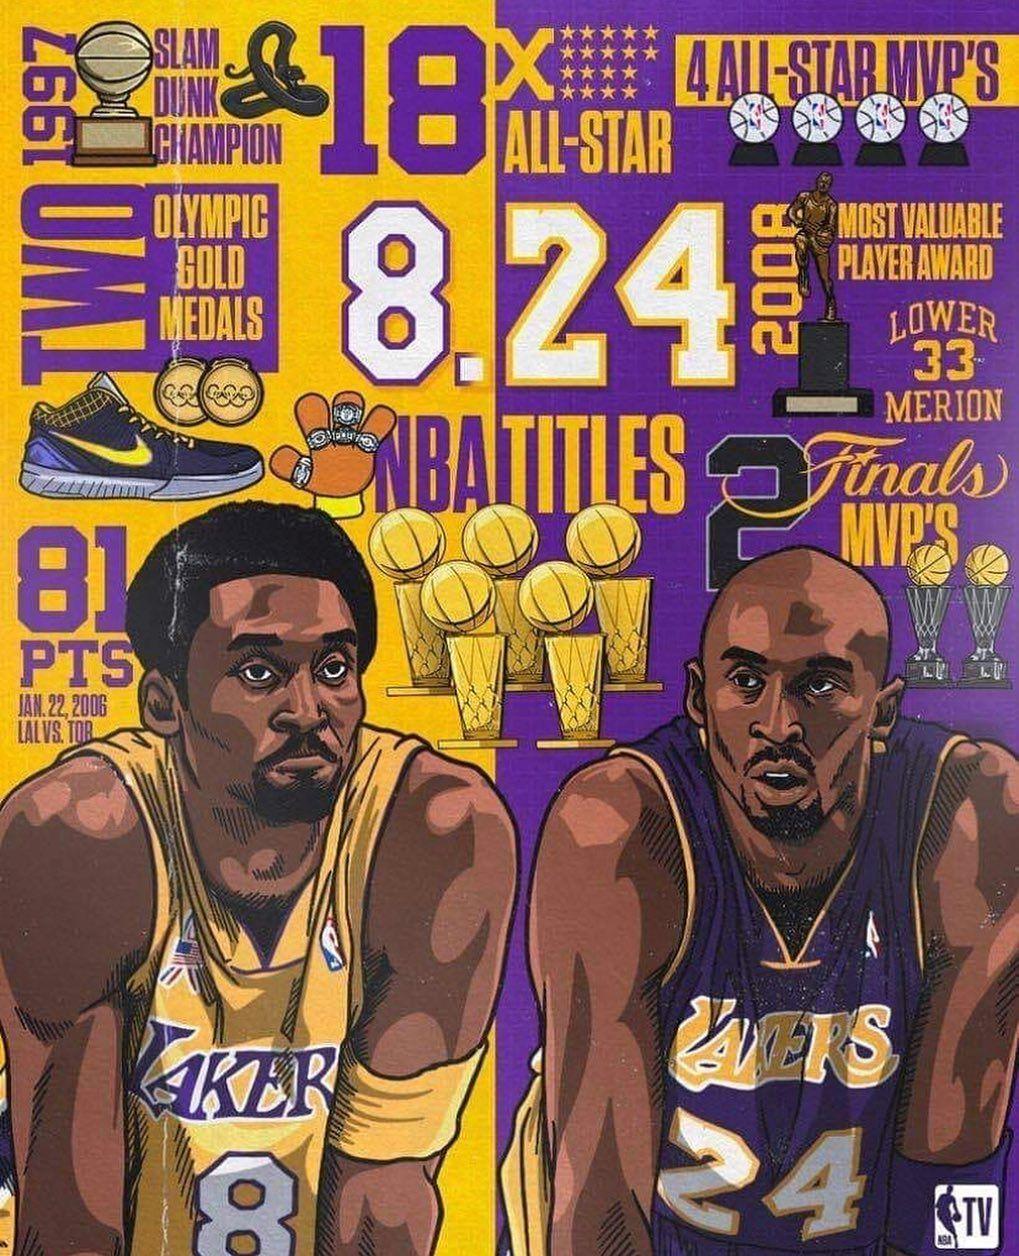 1 350 Likes 2 Comments Lakersbackintime16x Lakersbackintime On Instagram Kobe 8 24 Nba Kobe Bryant Poster Kobe Bryant Pictures Kobe Bryant Wallpaper